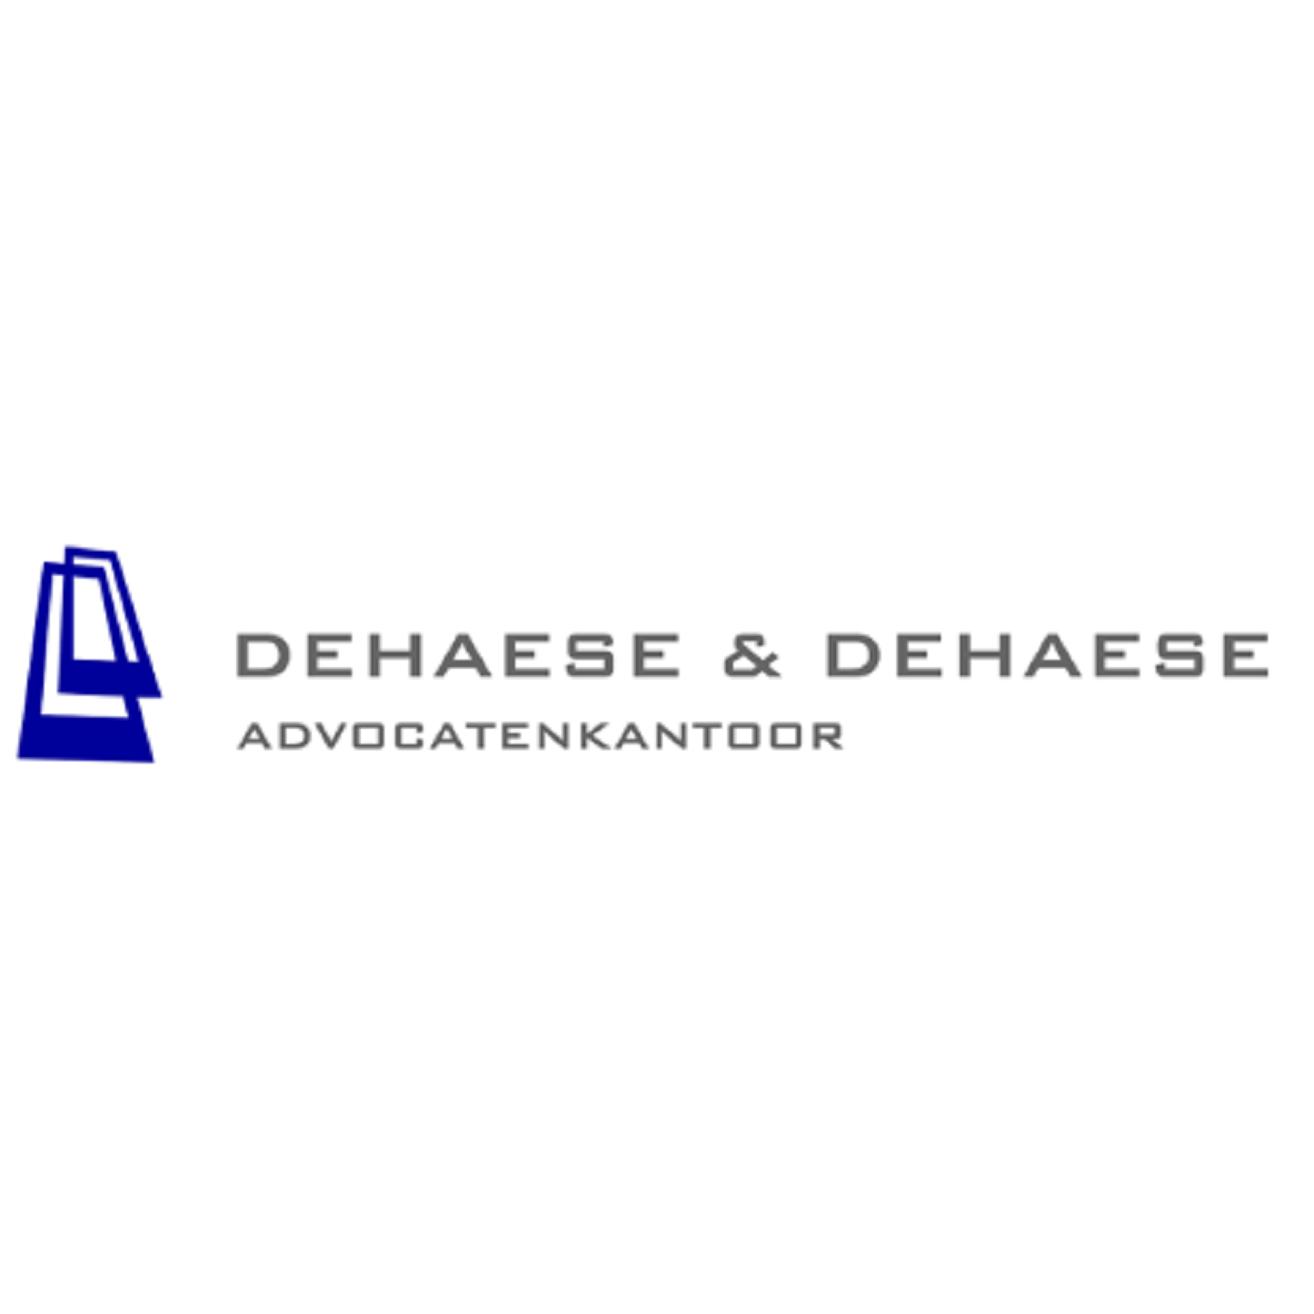 Dehaese & Dehaese Advocatenkantoor